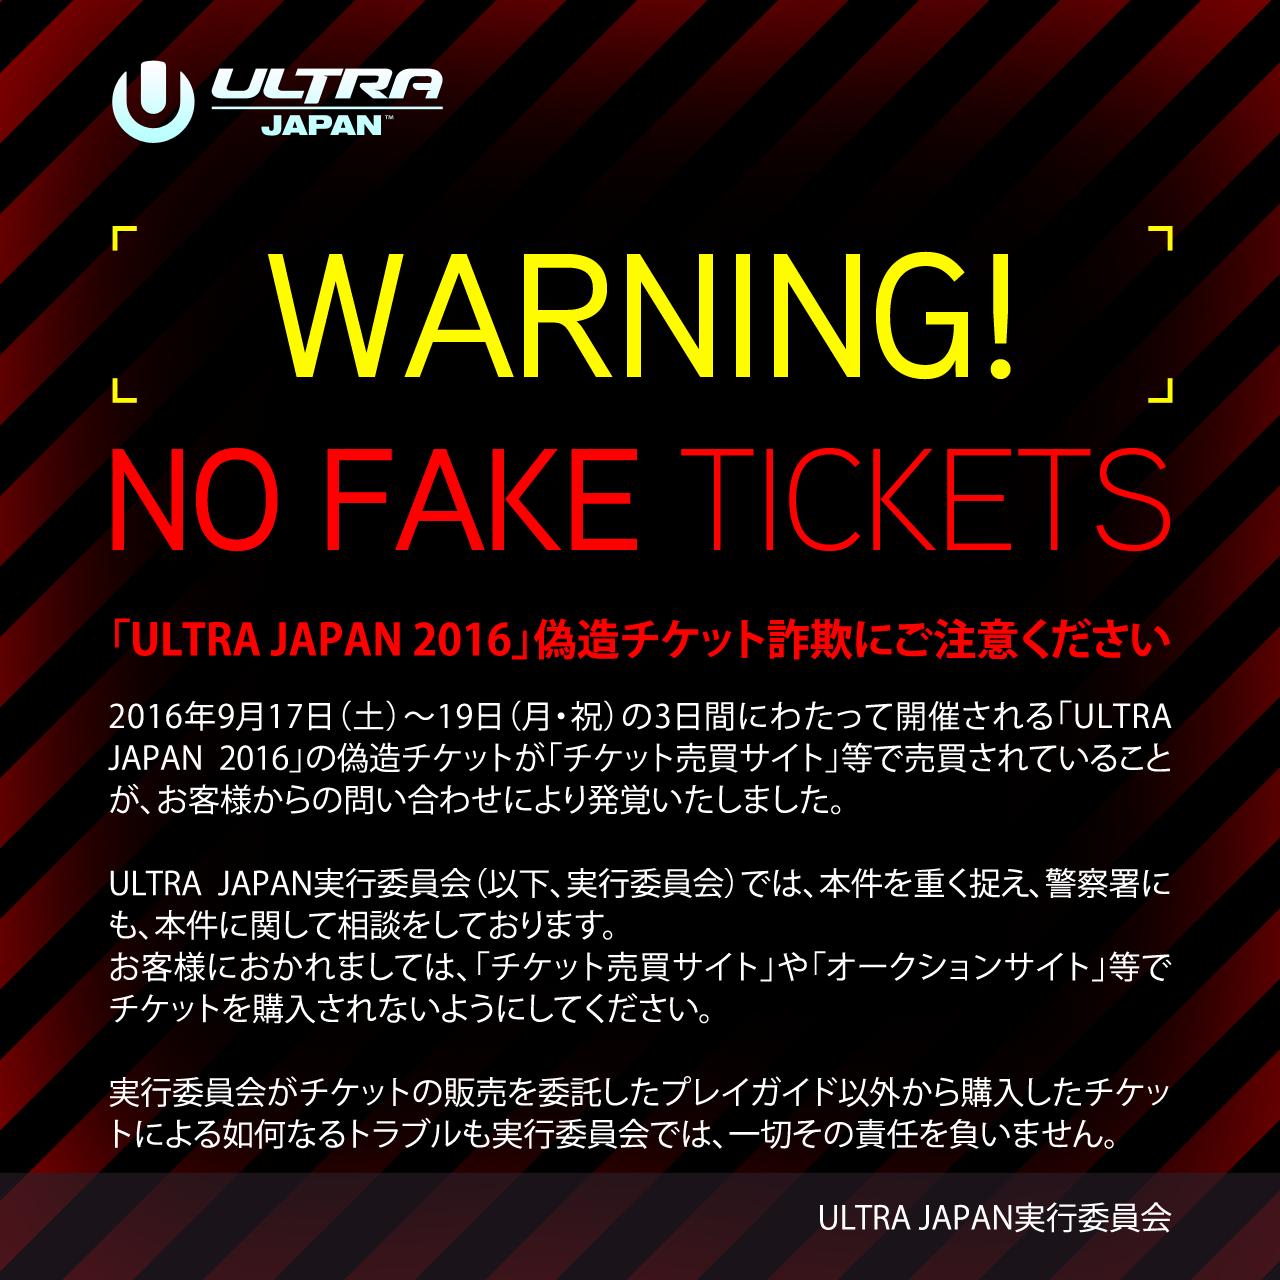 ultra-japan-2016-no-fake-tickets